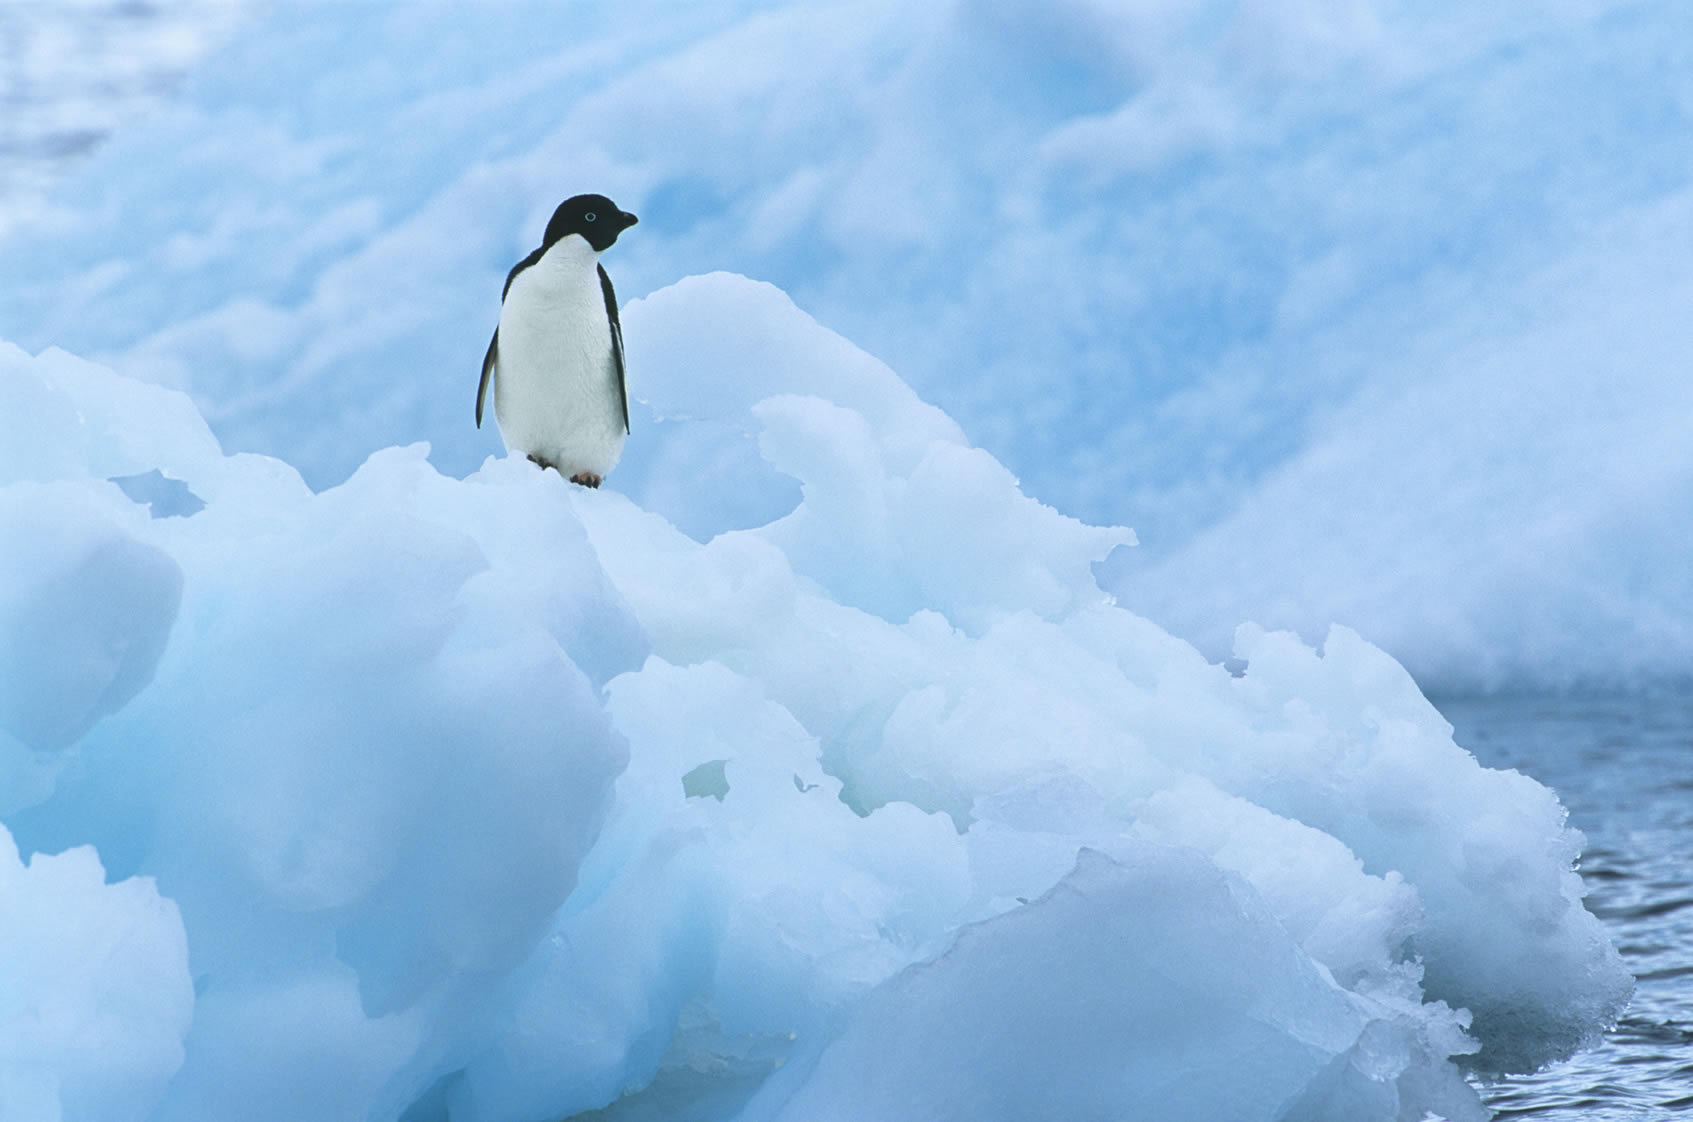 Tratado Antártico de 1959